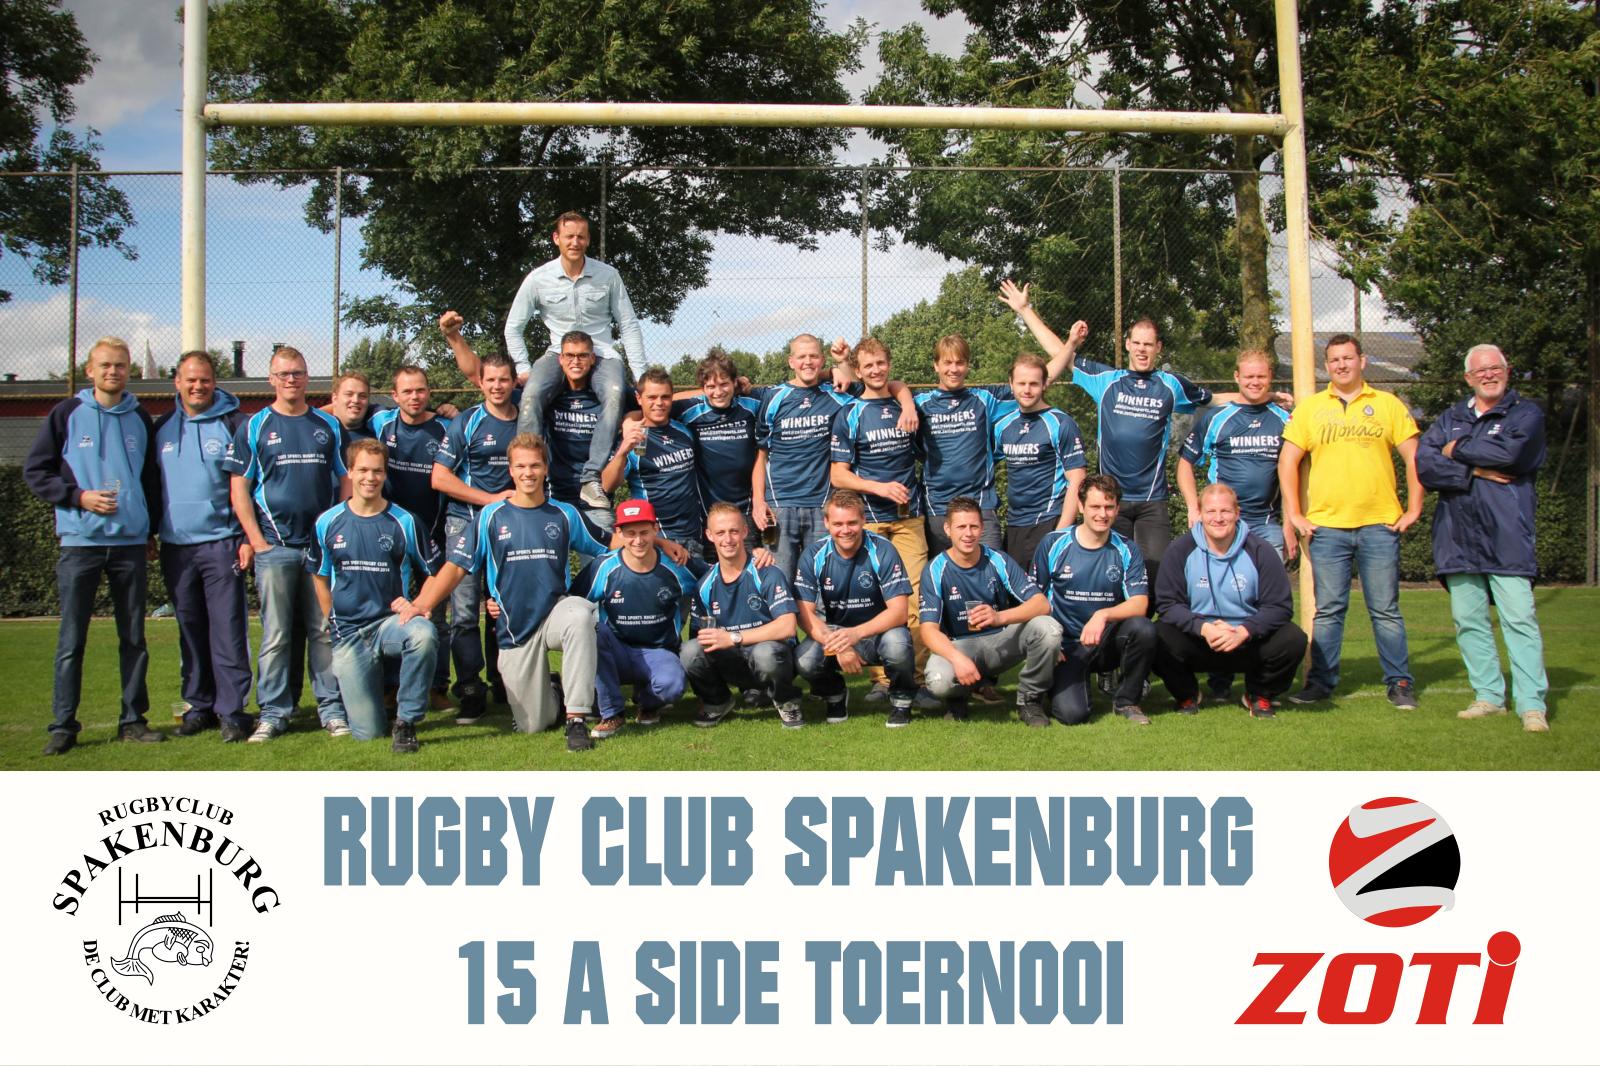 2014-08-30 | RCS Wint Zoti's Rugby Club Spakenburg Toernooi 2014